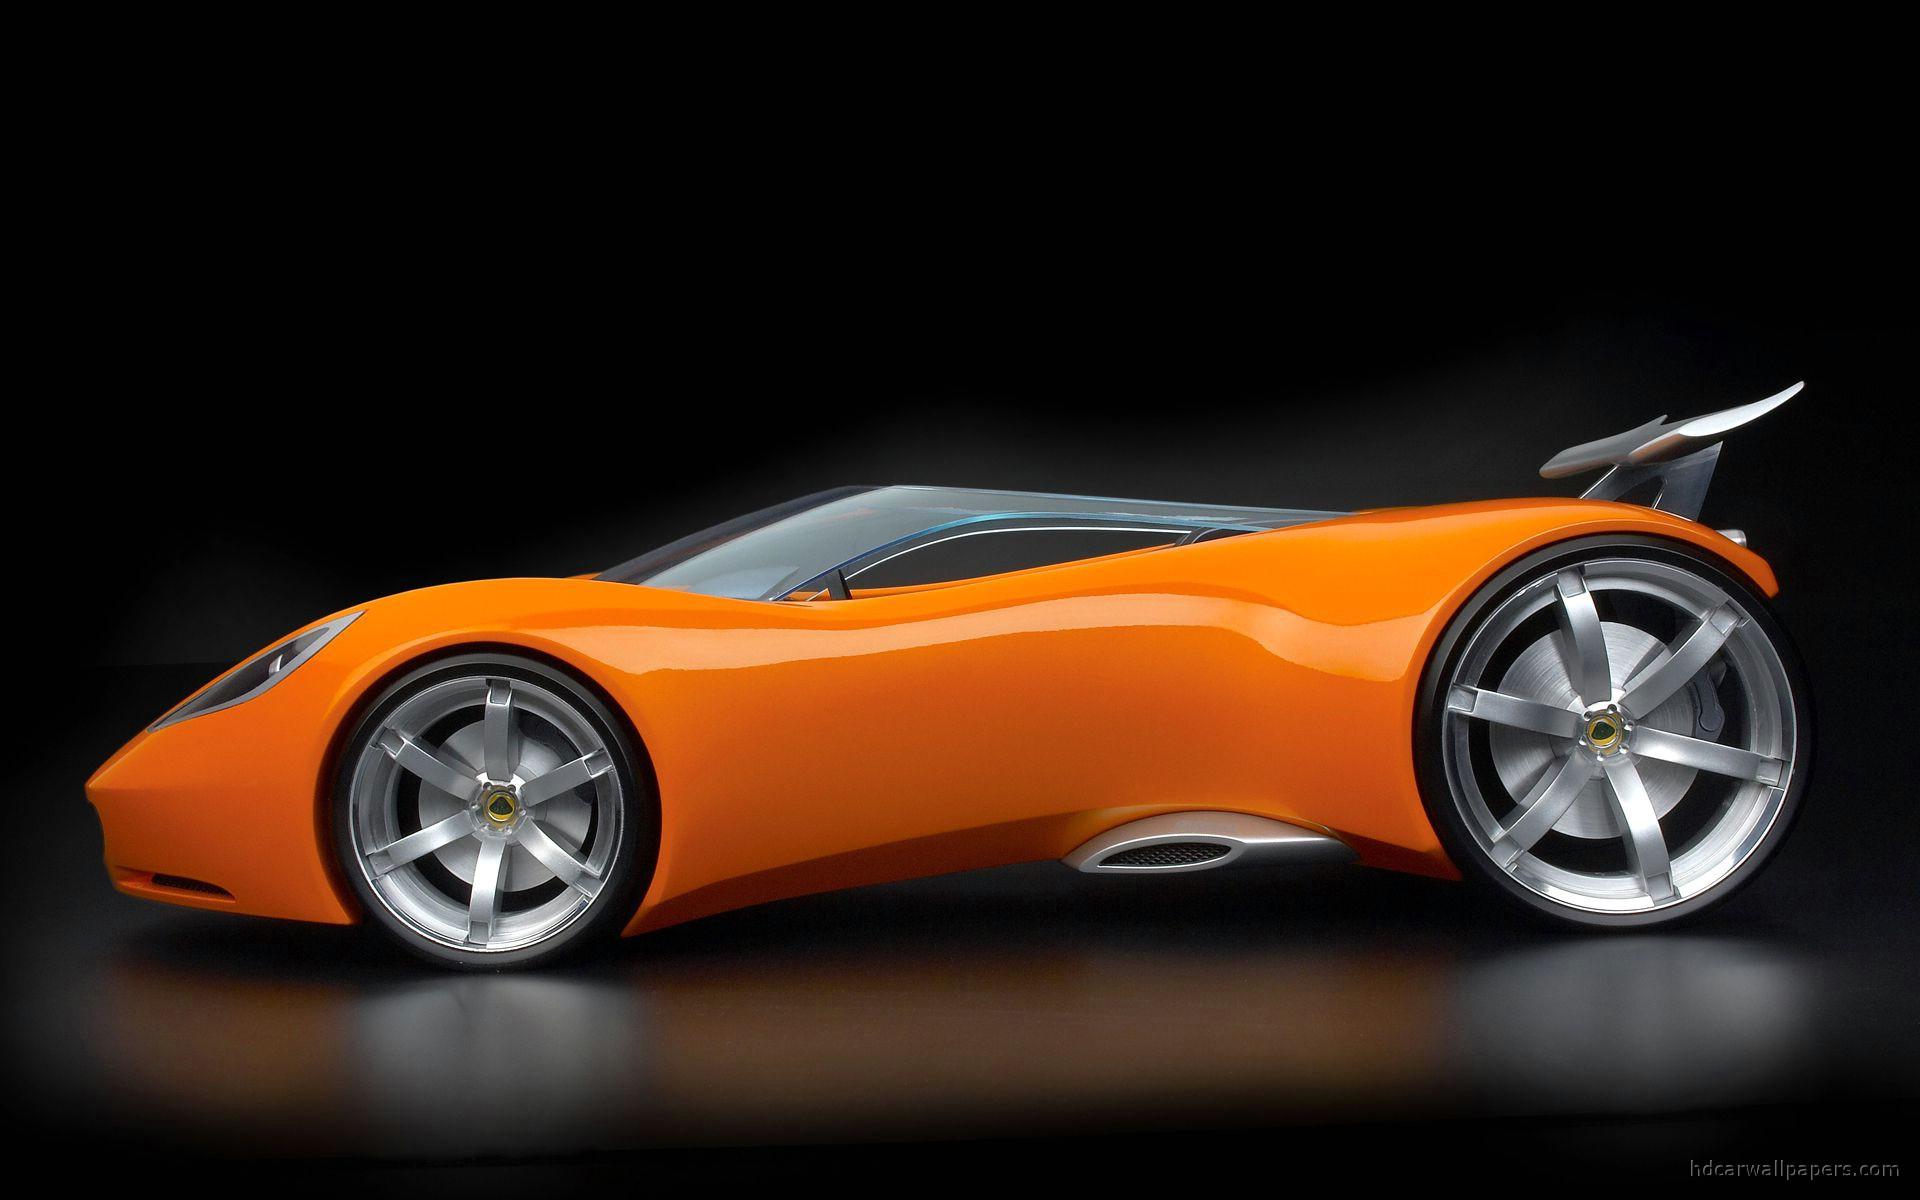 Lotus Hot Wheels Concept 4 Wallpaper   HD Car Wallpapers ...